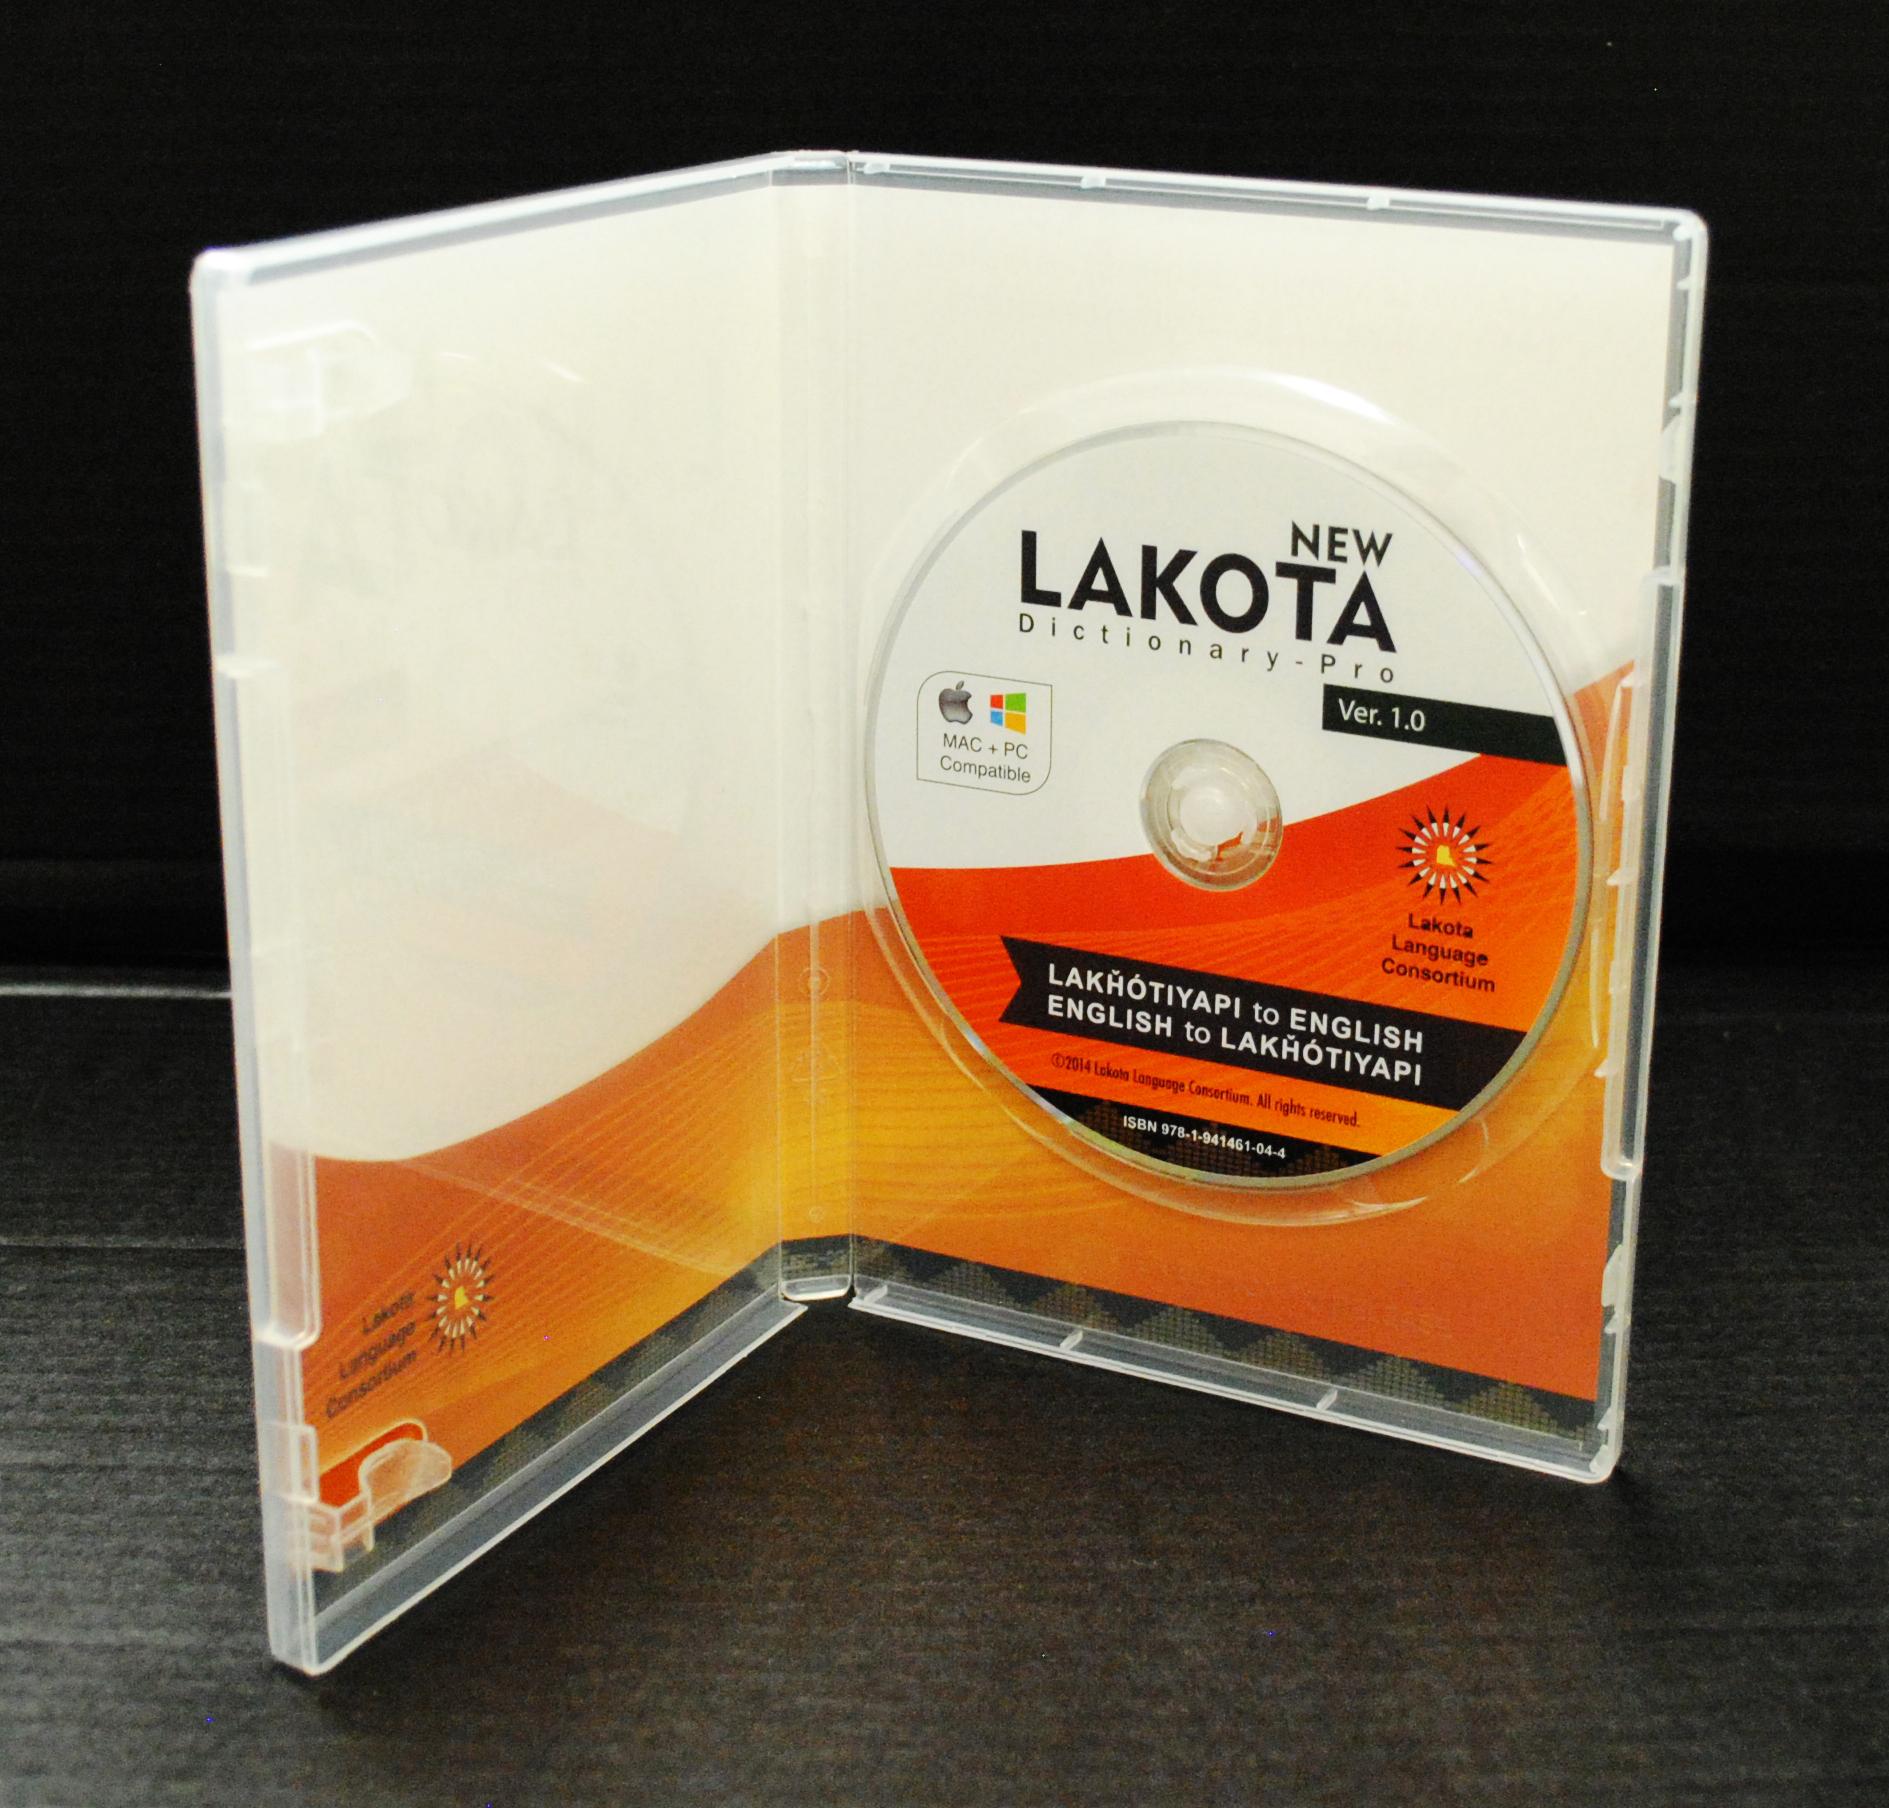 Lakota Language Consortium NLD-Pro Now Available in DVD